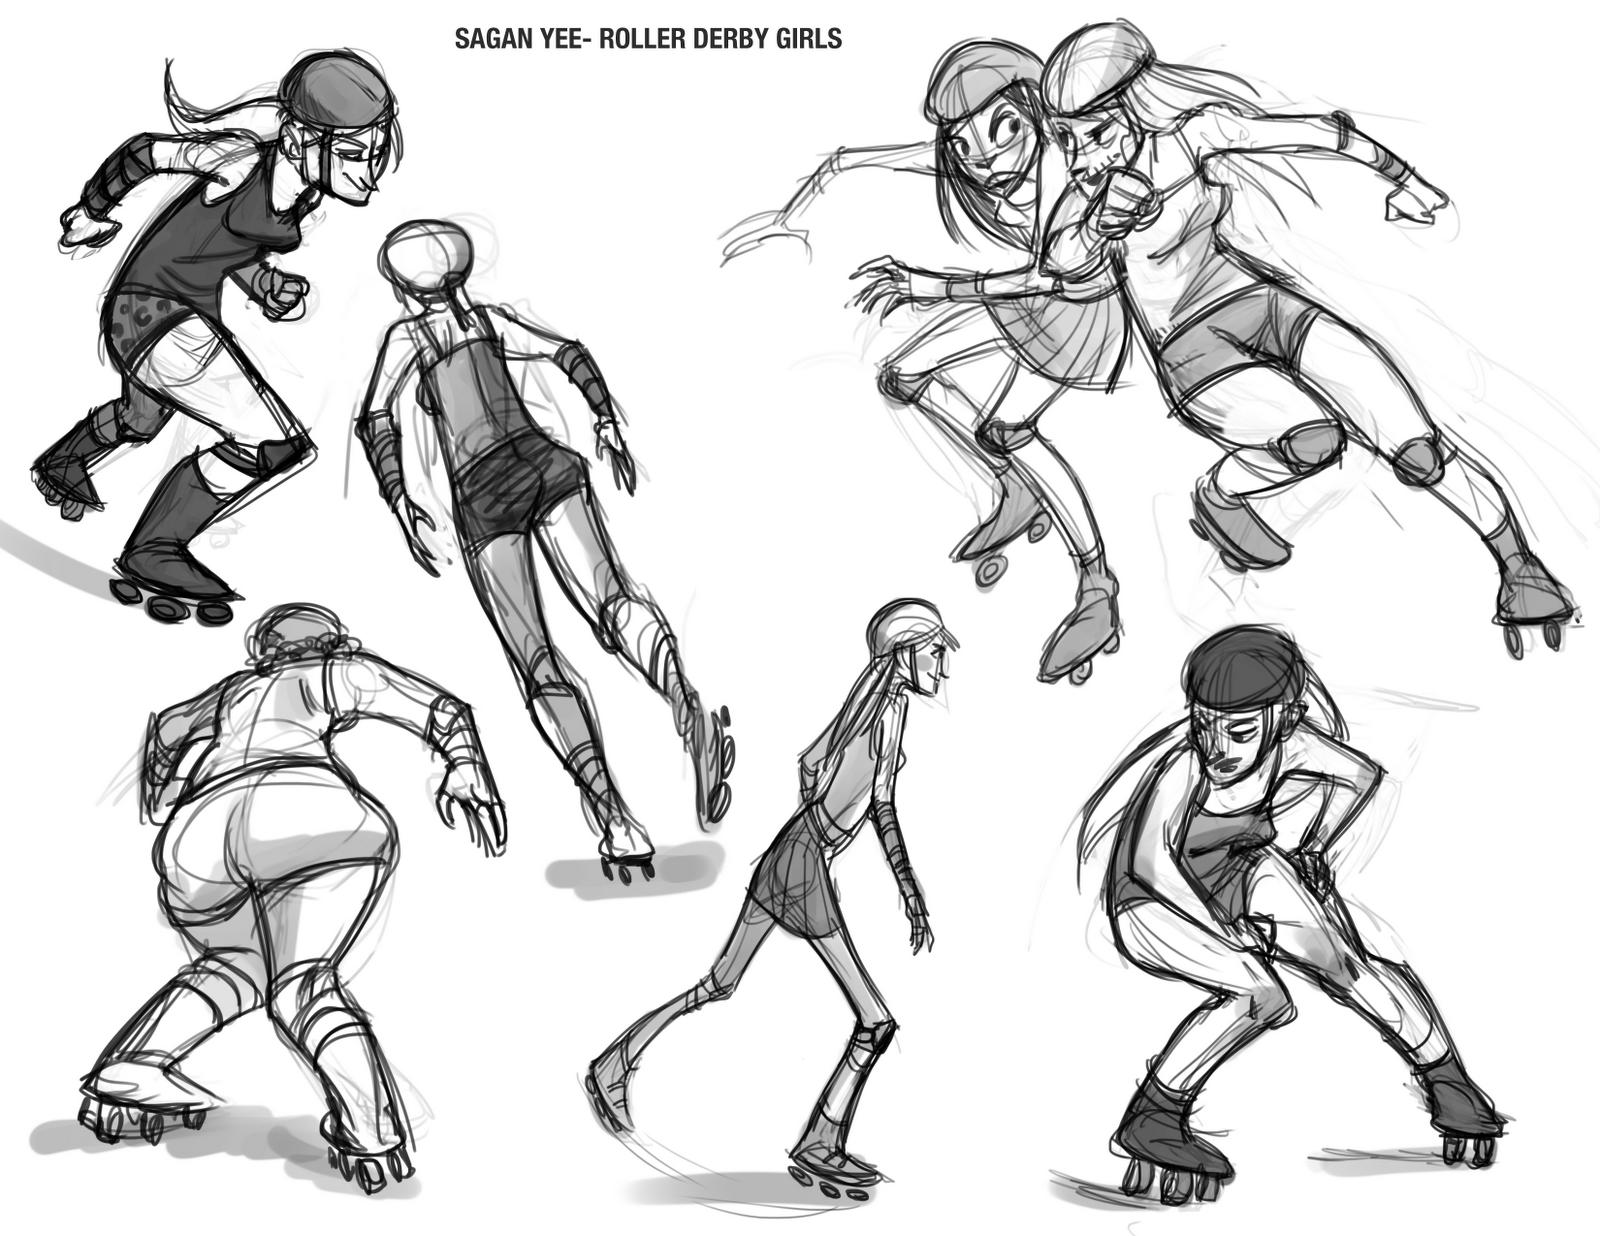 Saganimation The Art of Sagan Yee Roller Derby gestures